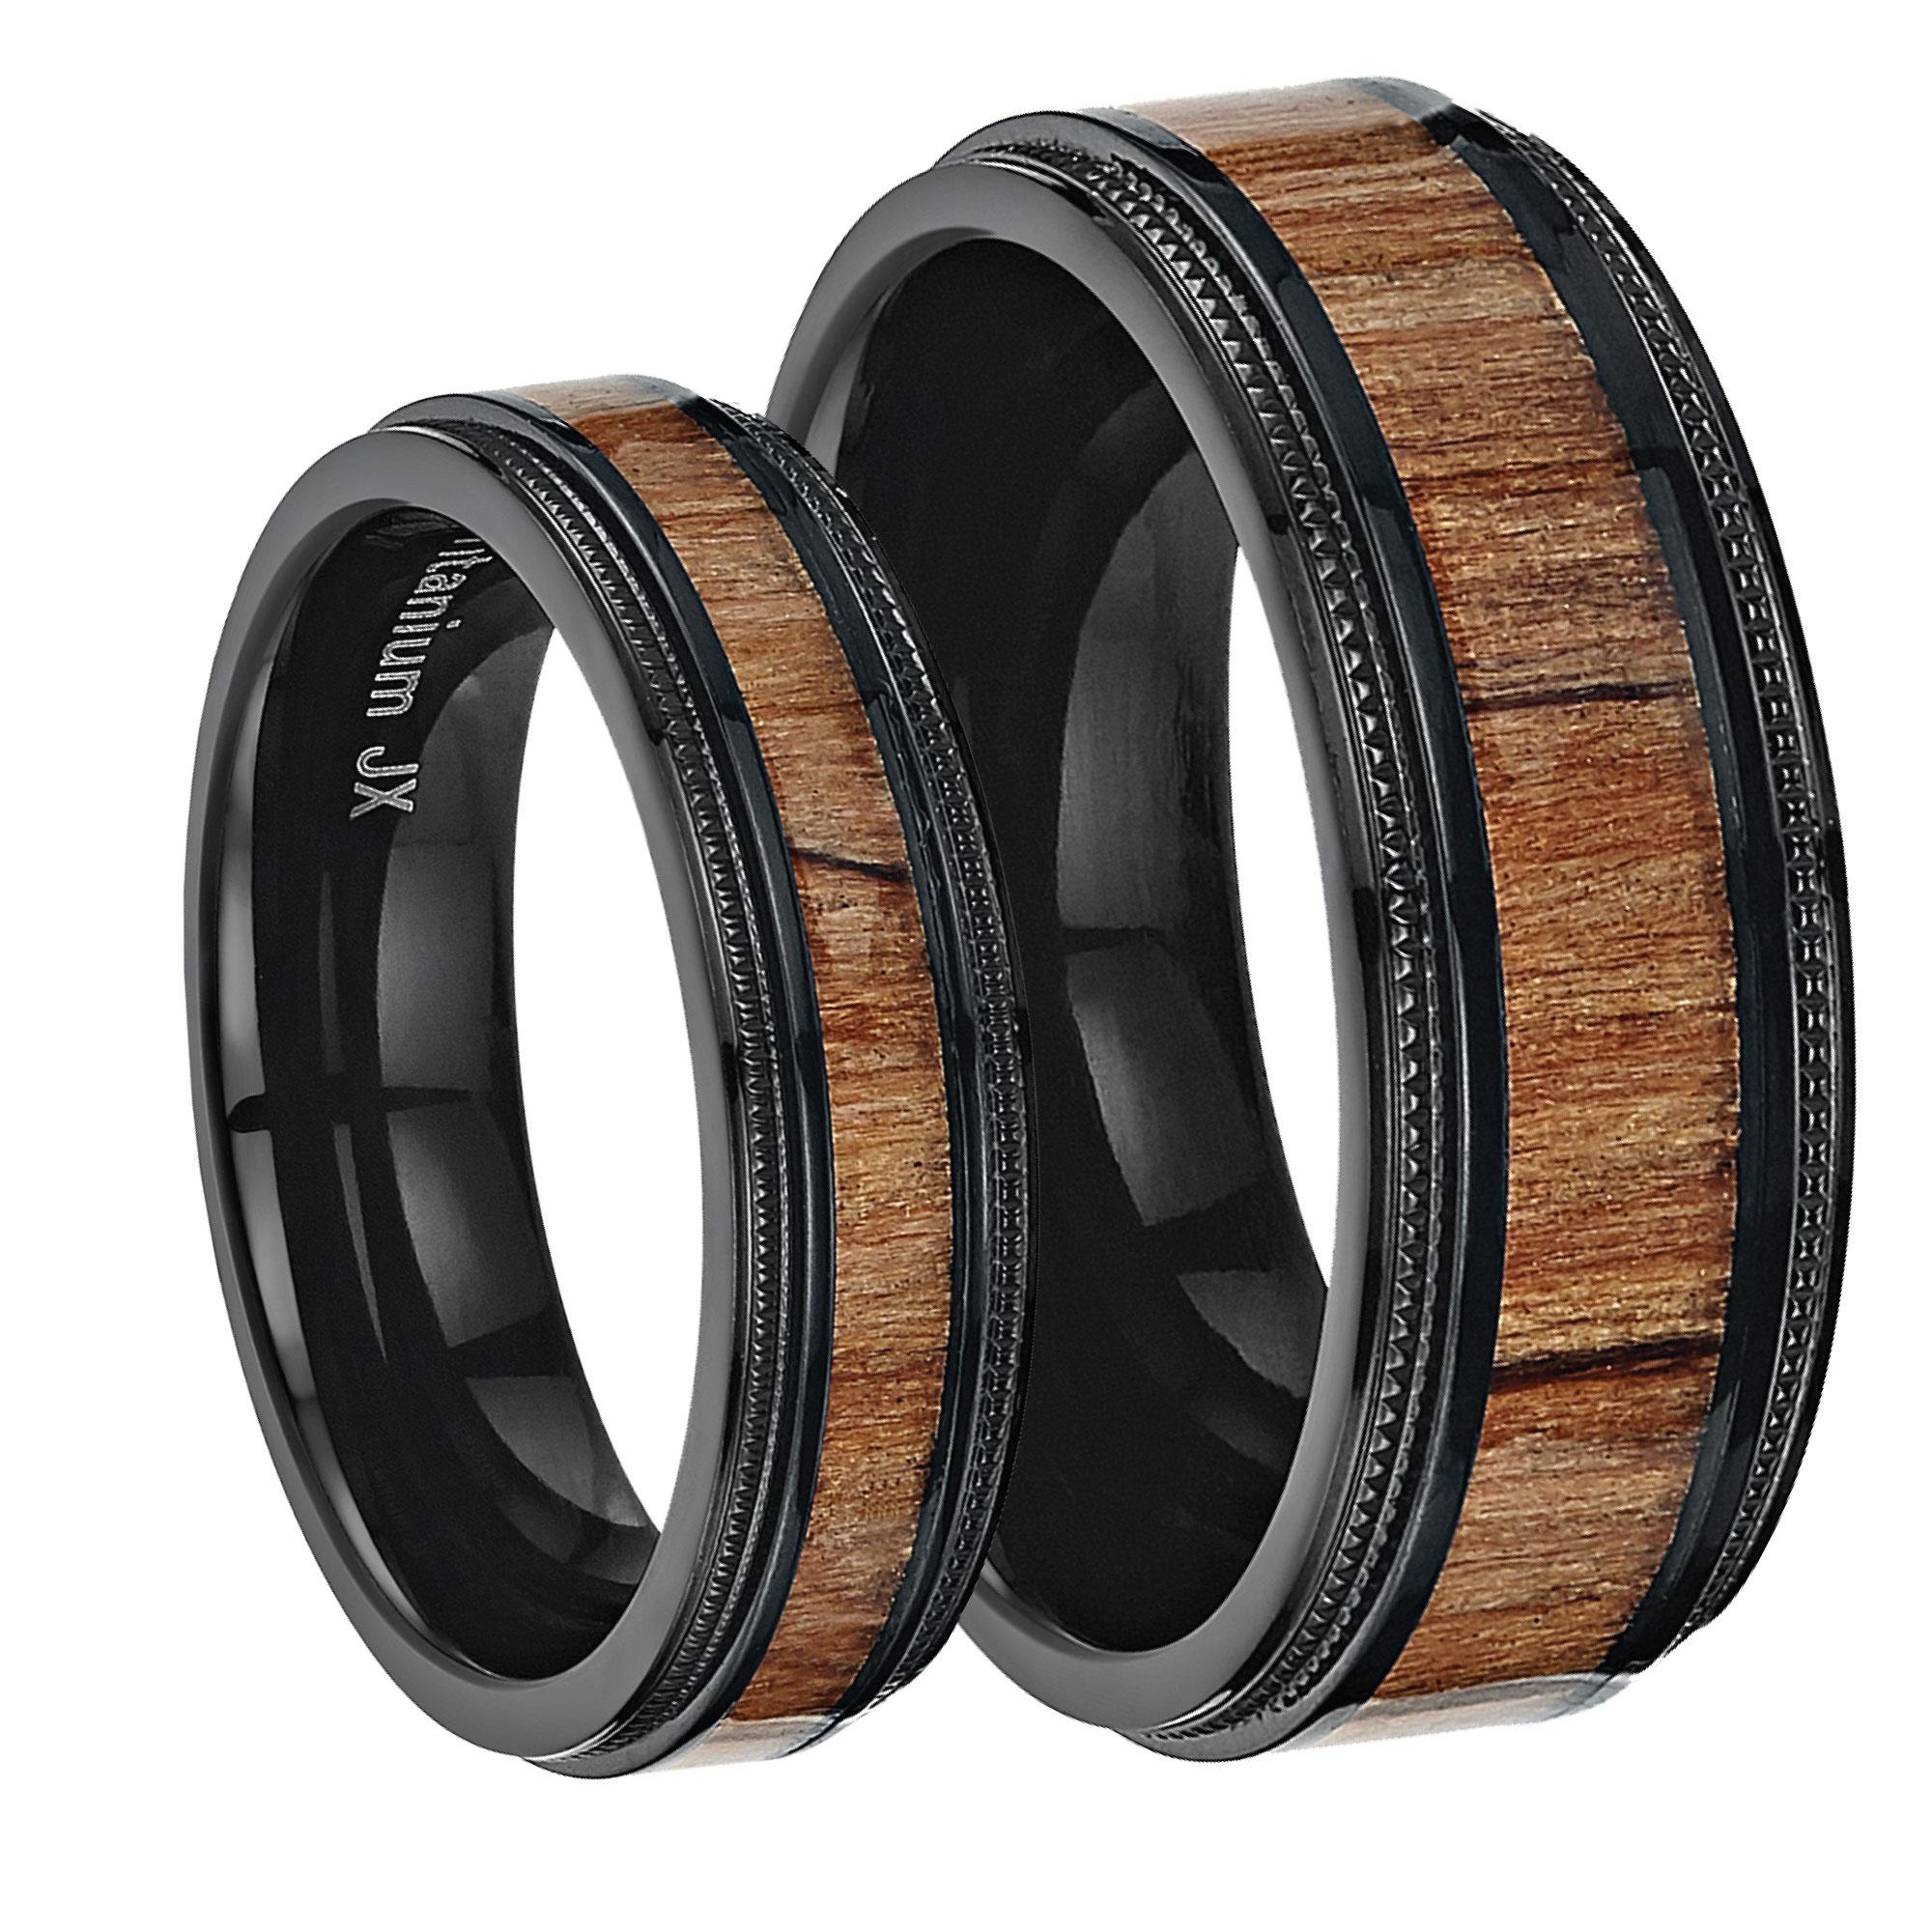 His & Hers Black Titanium Wedding Ring Band Set with Koa Wood Inlay